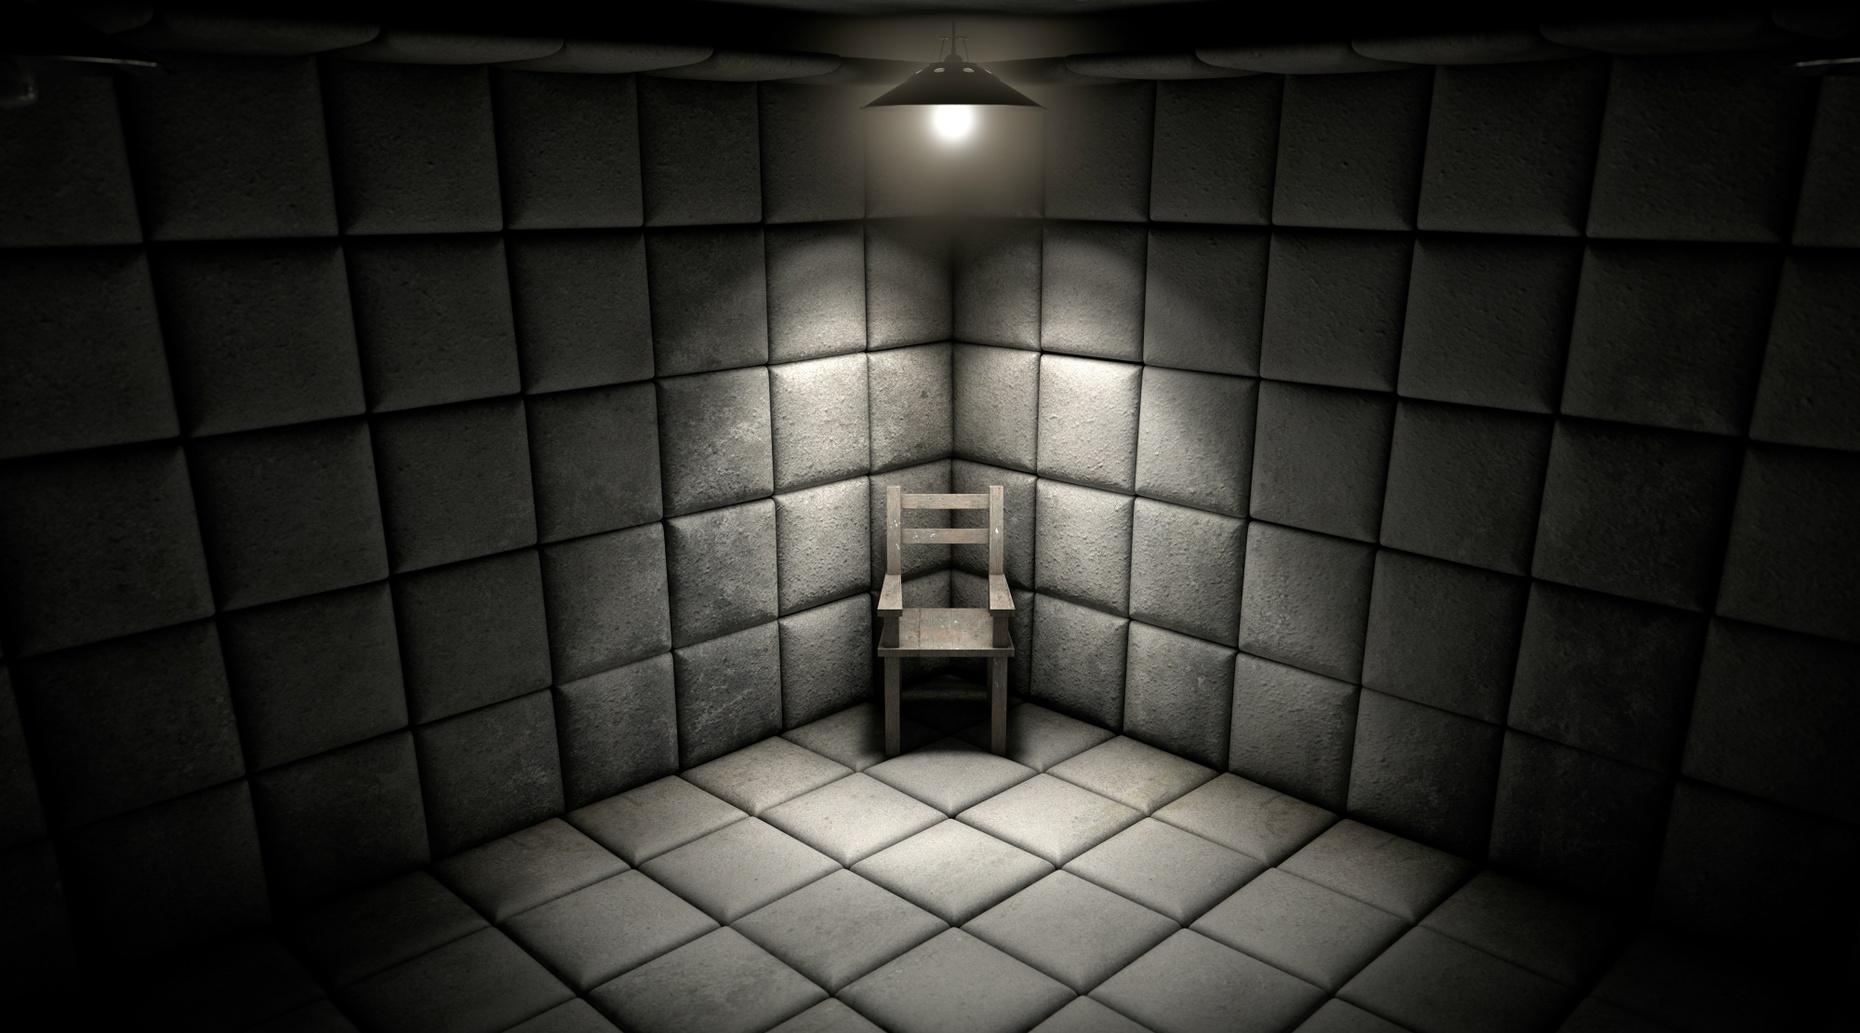 Secret Agent 2.0 Escape Room Game in Salisbury